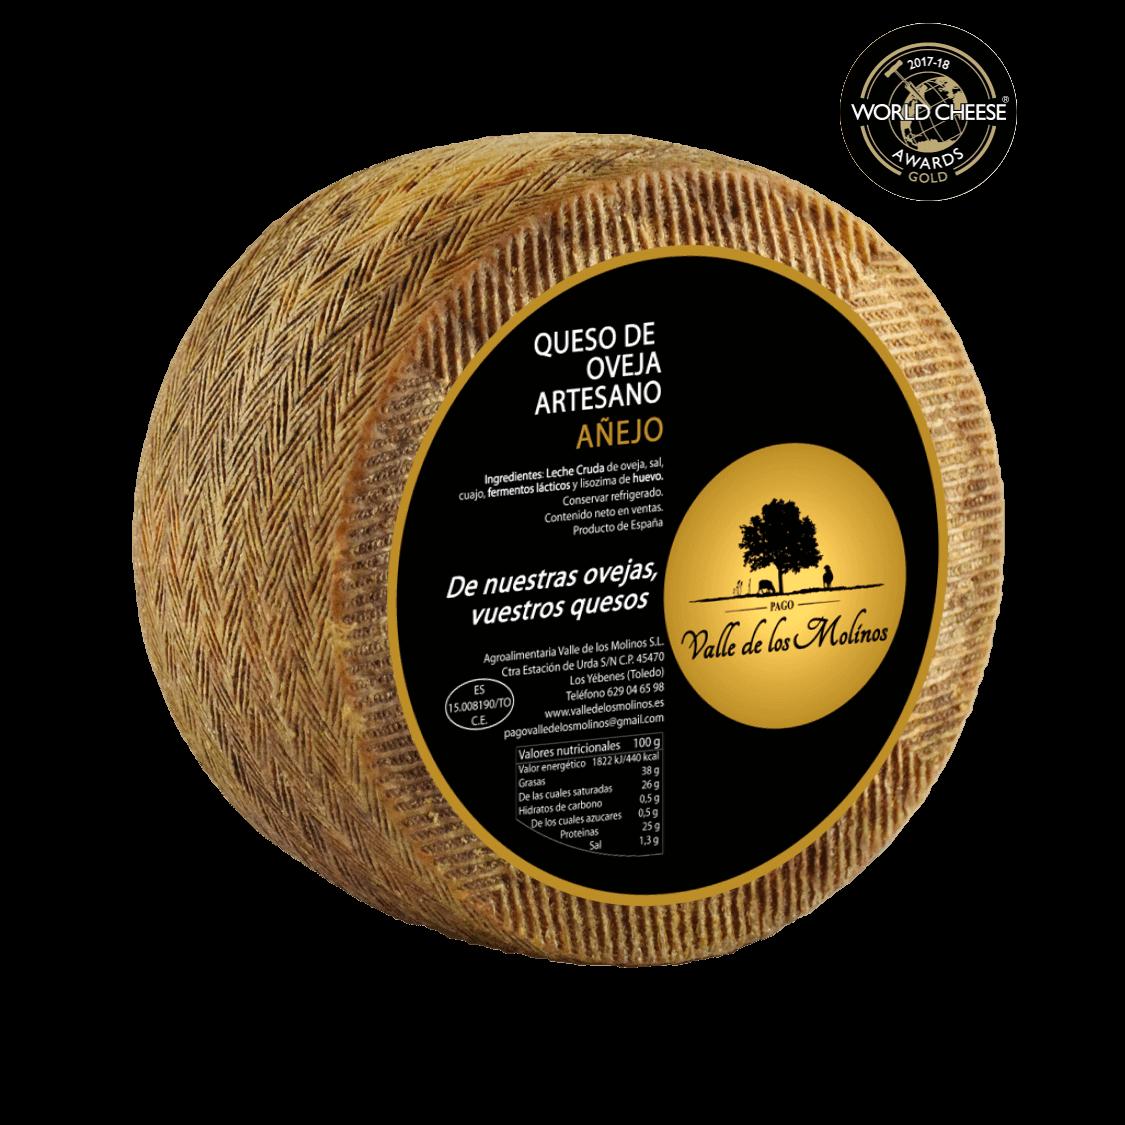 queso manchego_queso de oveja_ queso artesanal_quesos online madrid